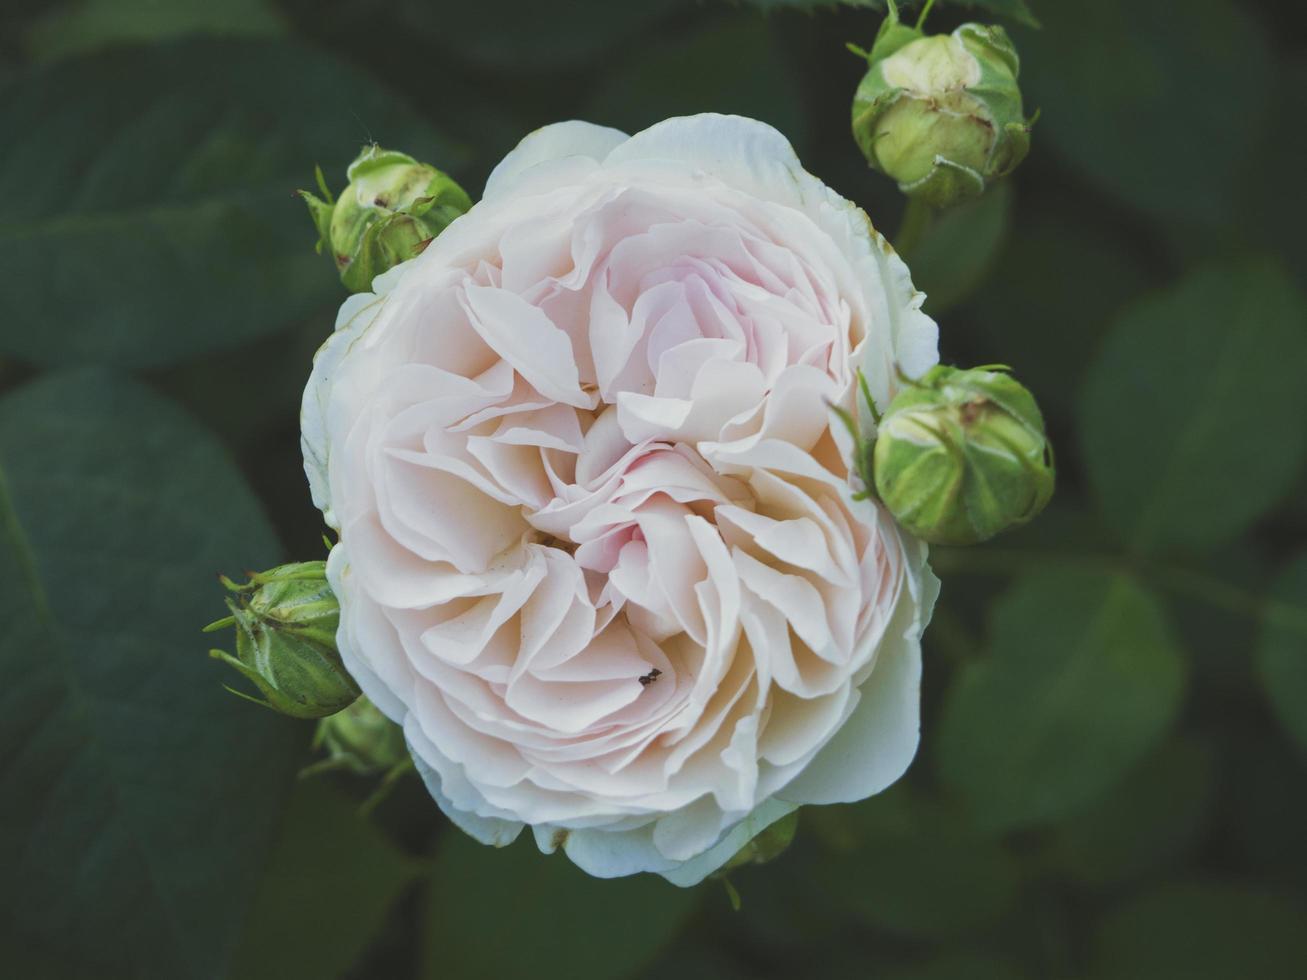 Nahaufnahme der rosa Pfingstrose foto